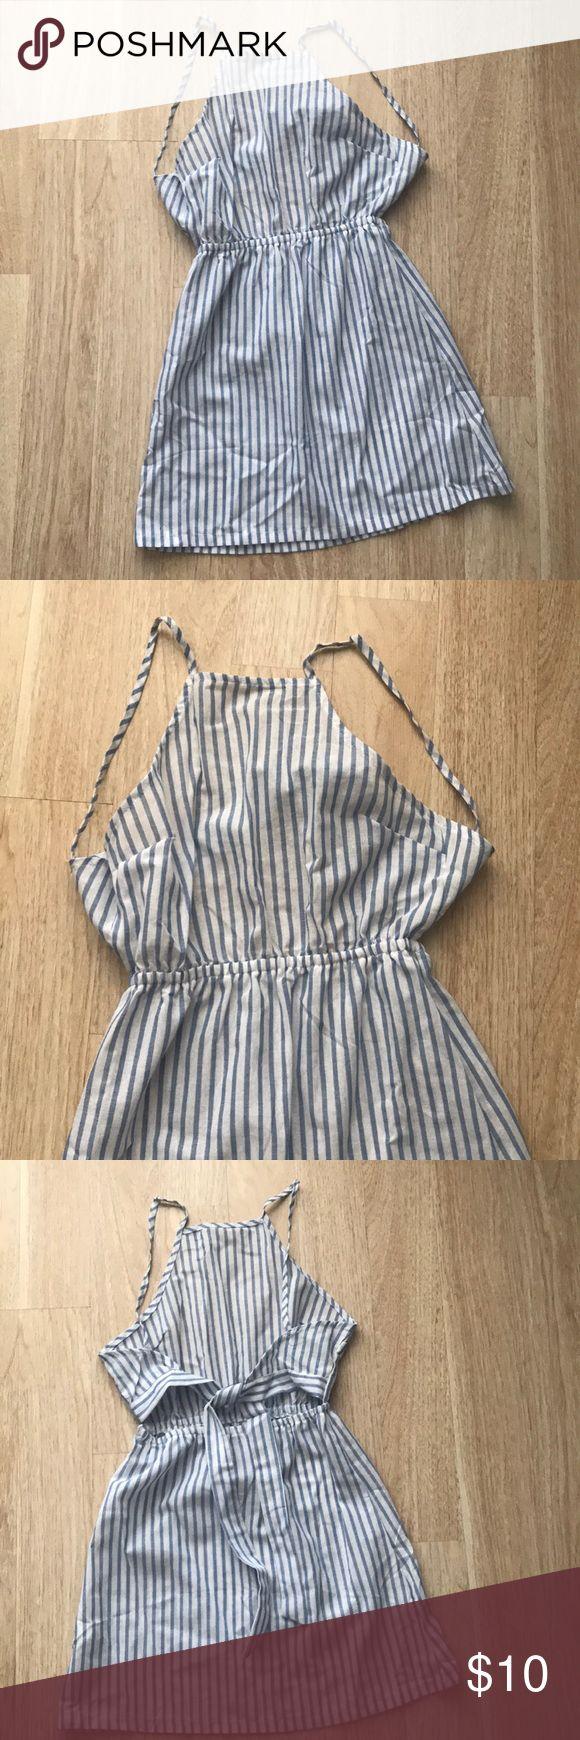 RomWe mini open back blue striped dress Light sun/beach dress. Size is XS. Recommended for small petite ladies. ROMWE Dresses Mini